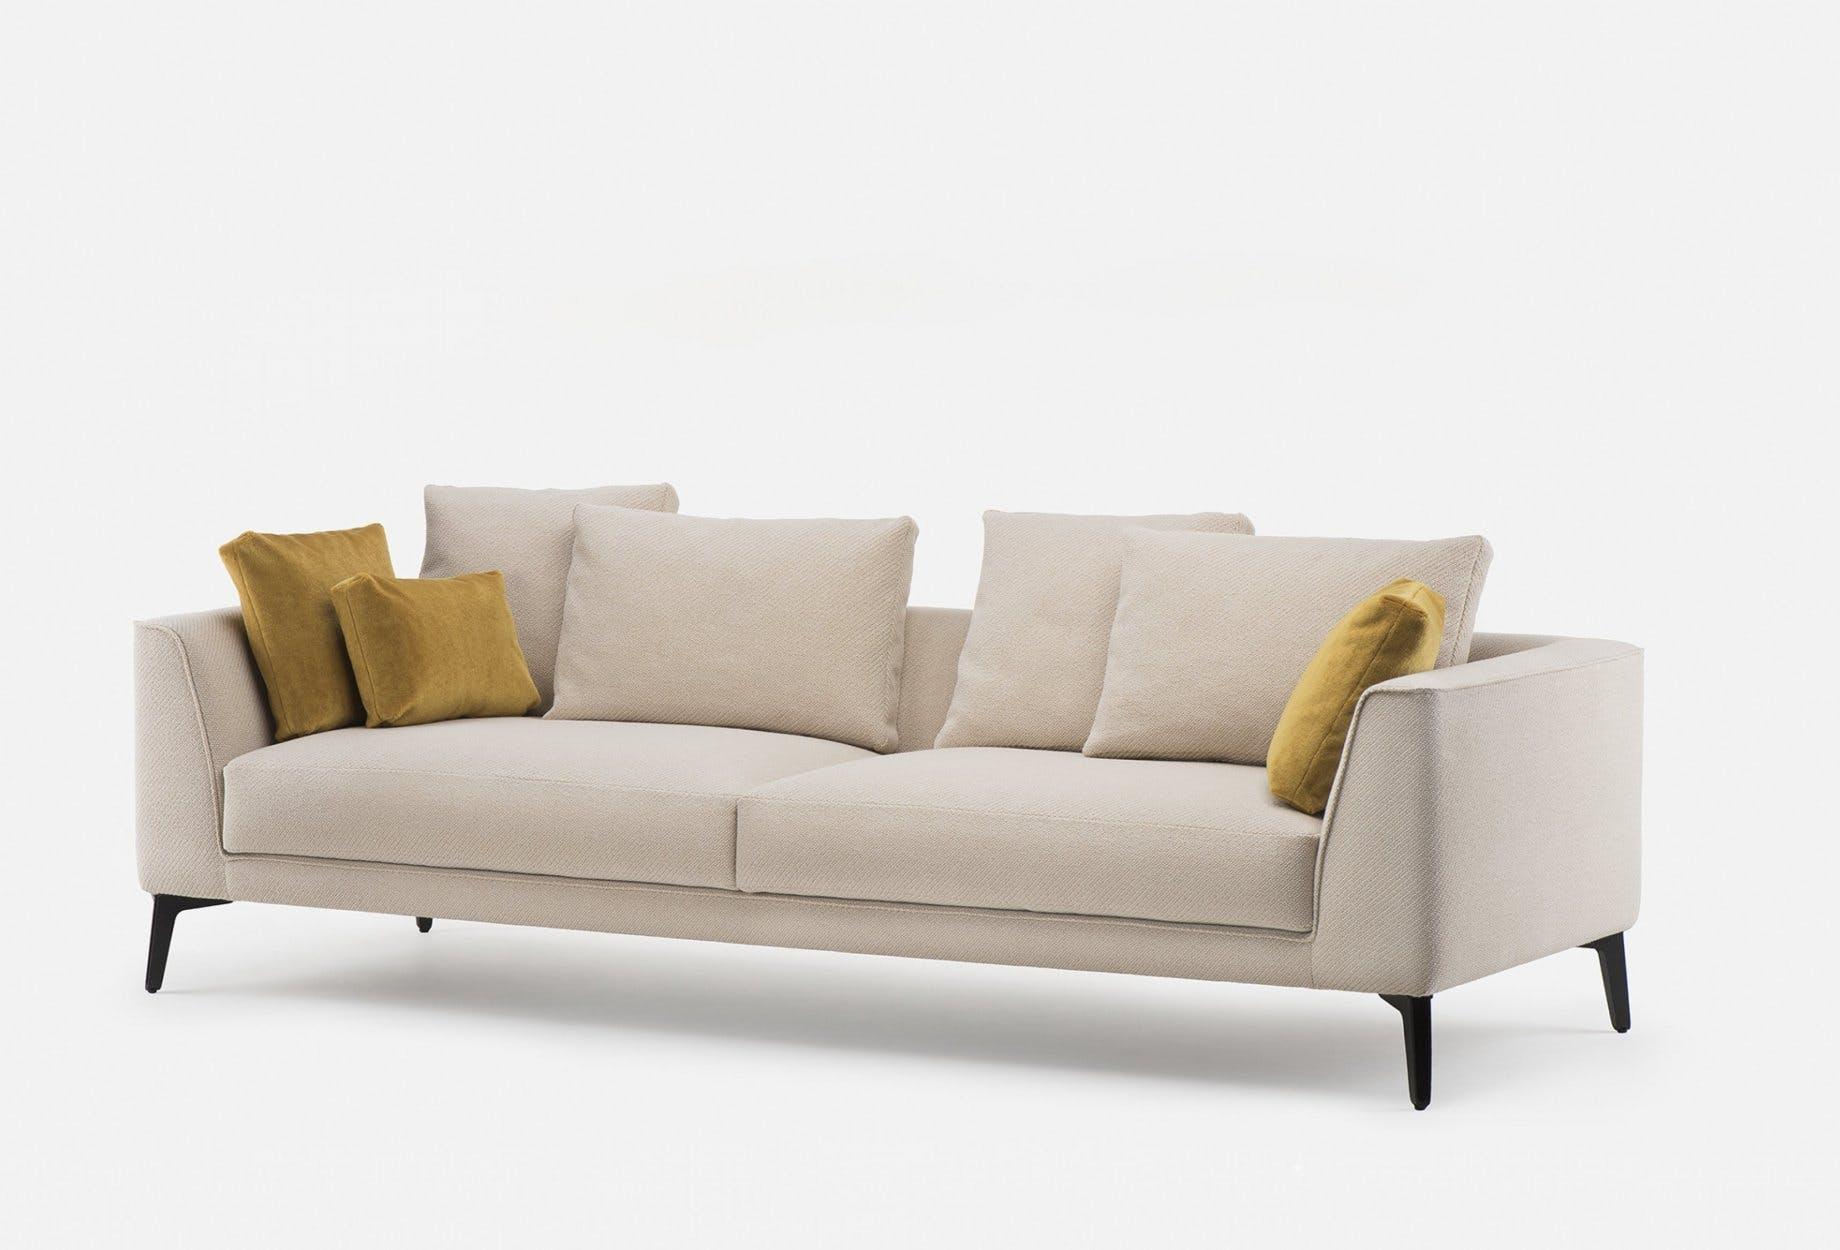 401 Mc Queen Sofa By Matthew Hilton In Coda 2 422 Fabricweb 1840X1250